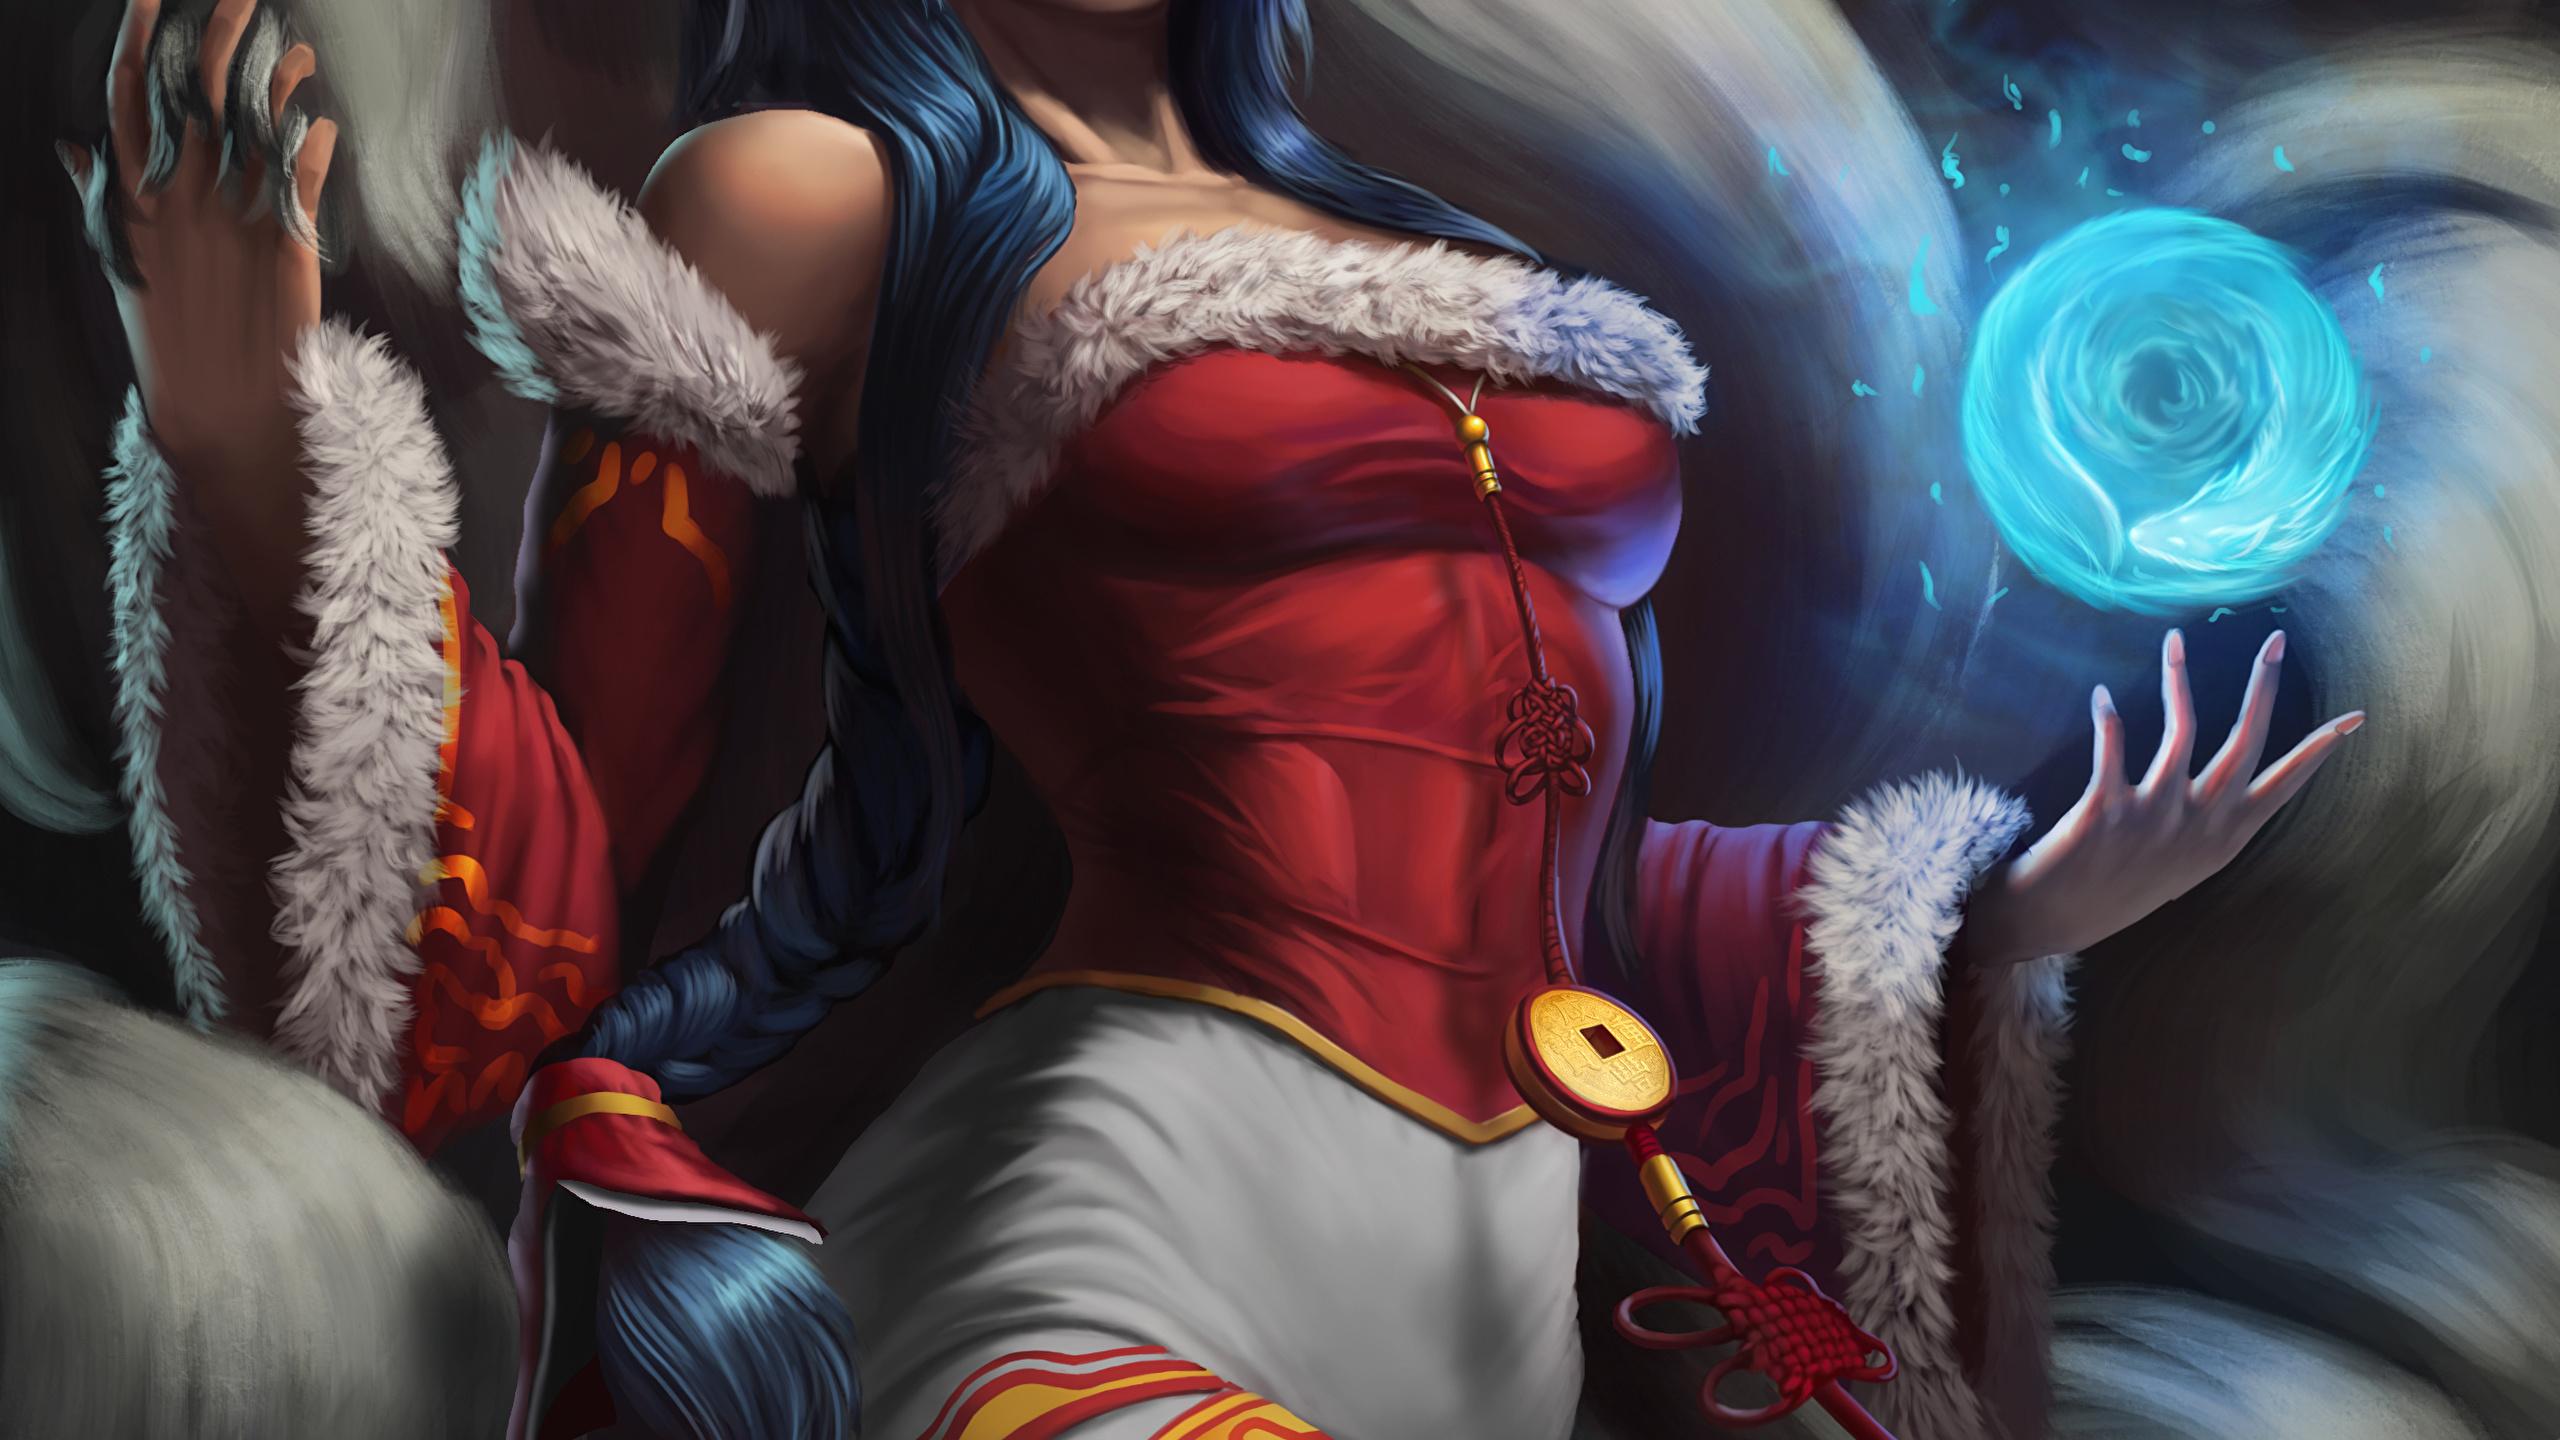 Desktop Wallpapers Ahri League Of Legends Sorcery Female 2560x1440